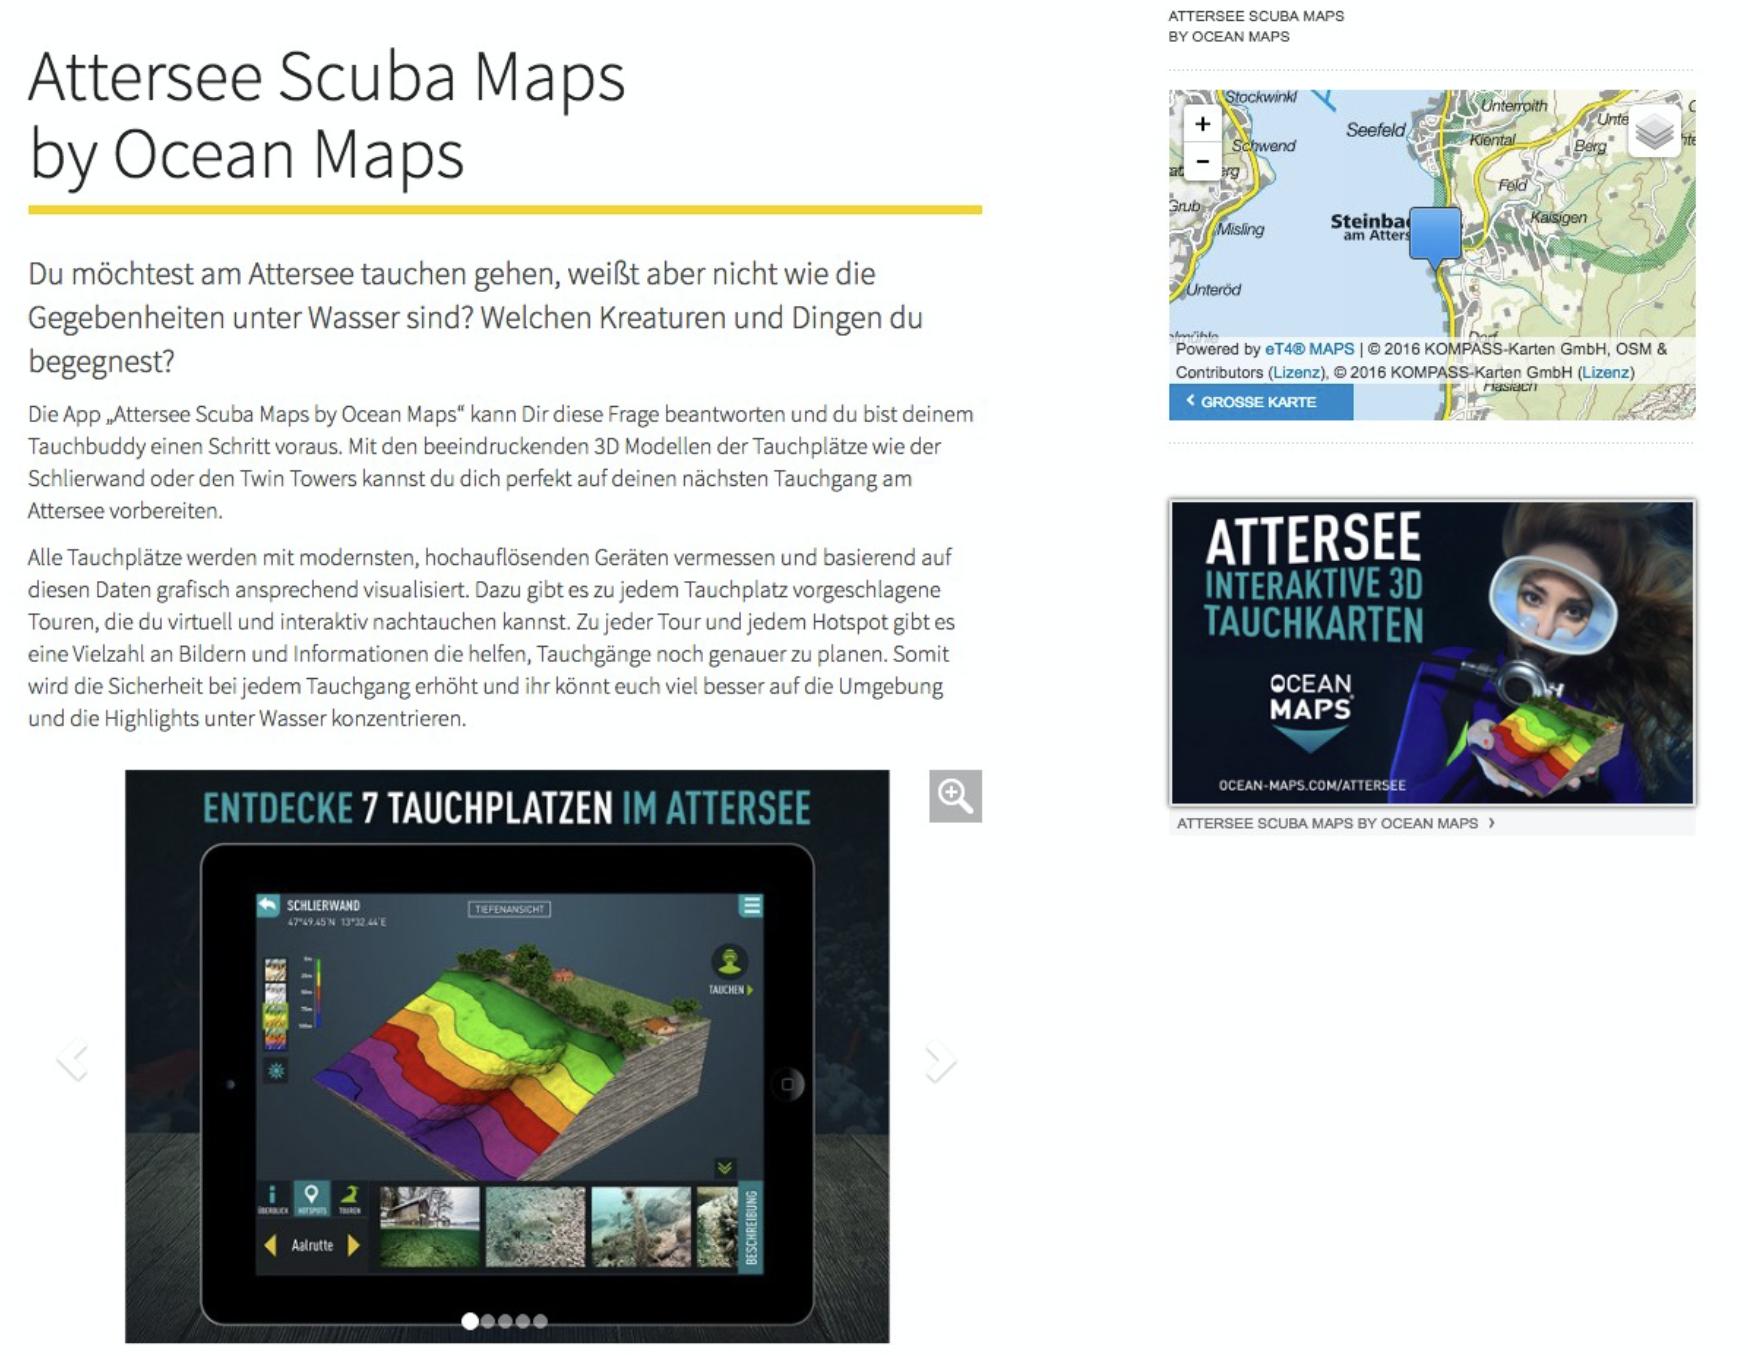 salzkammergut-attersee Ocean-Maps Scuba Maps Tauchkarten